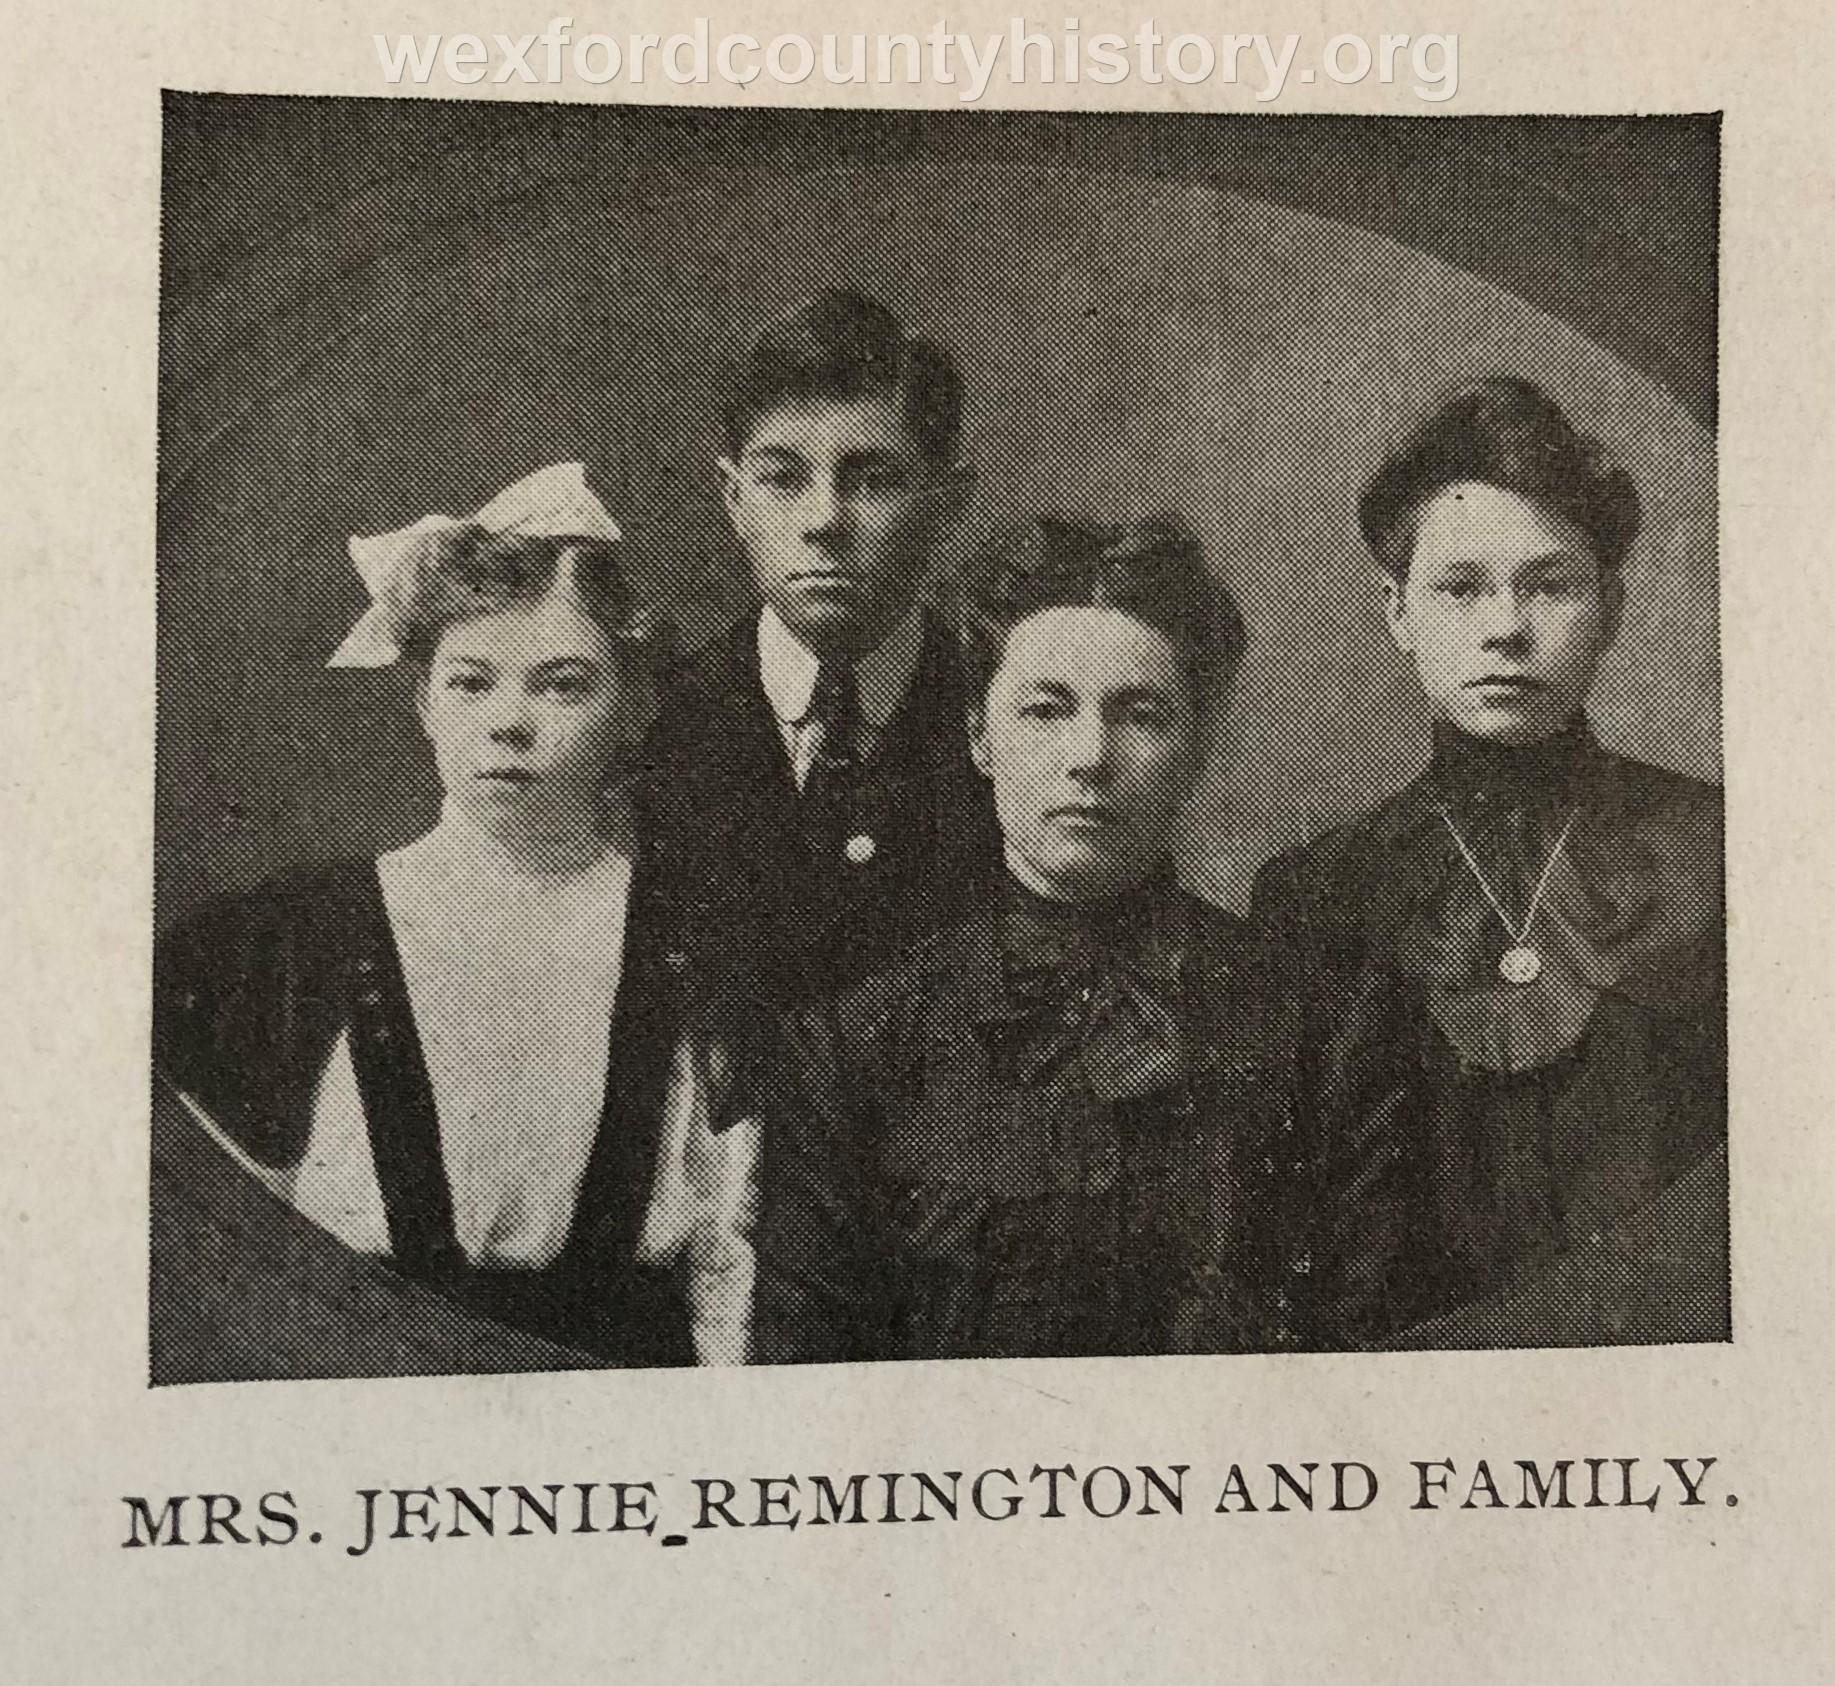 Mrs. Jennie Remington And Family